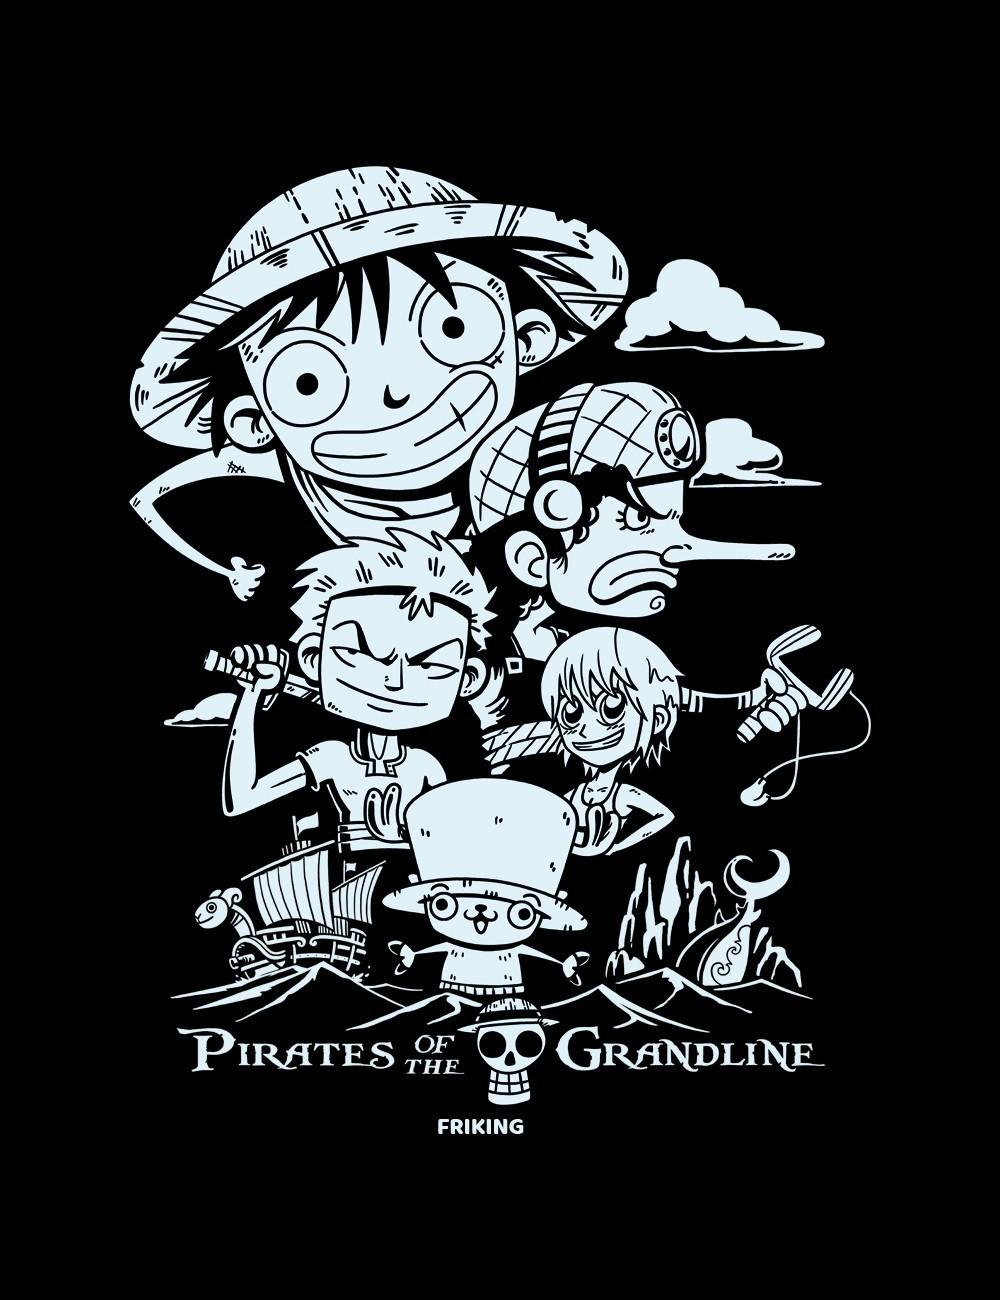 Pirates of the Grandline